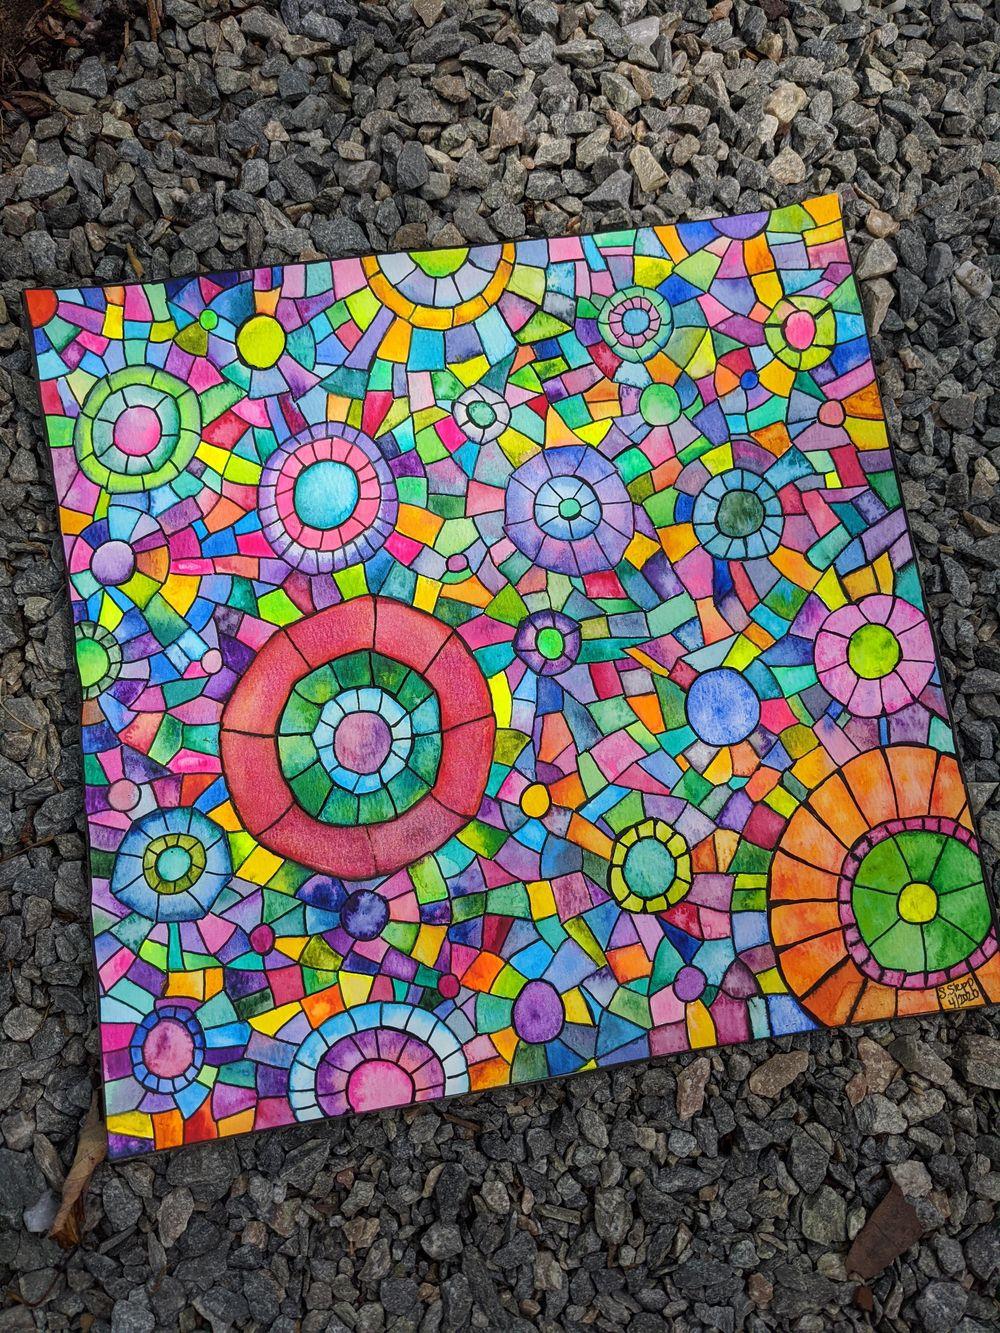 Mosaics -- Many Ways -- Seahorse, Sunset, Stained Glass Window, Yin Yang, Mermai - image 3 - student project